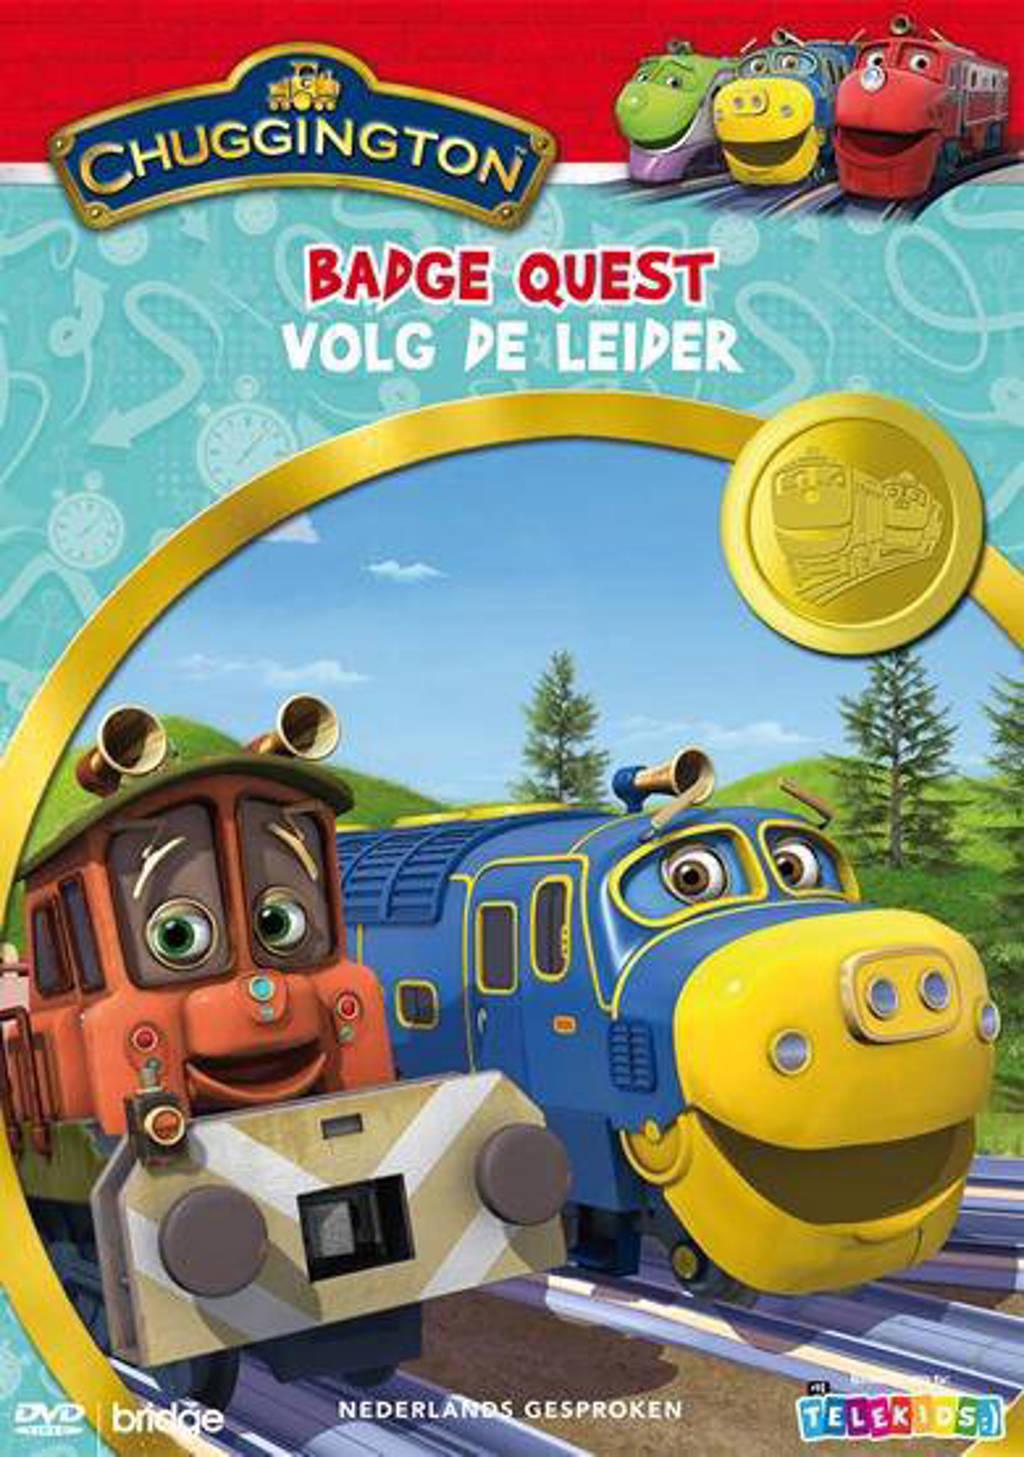 Chuggington - Badge quest 4 volg je leider (DVD)